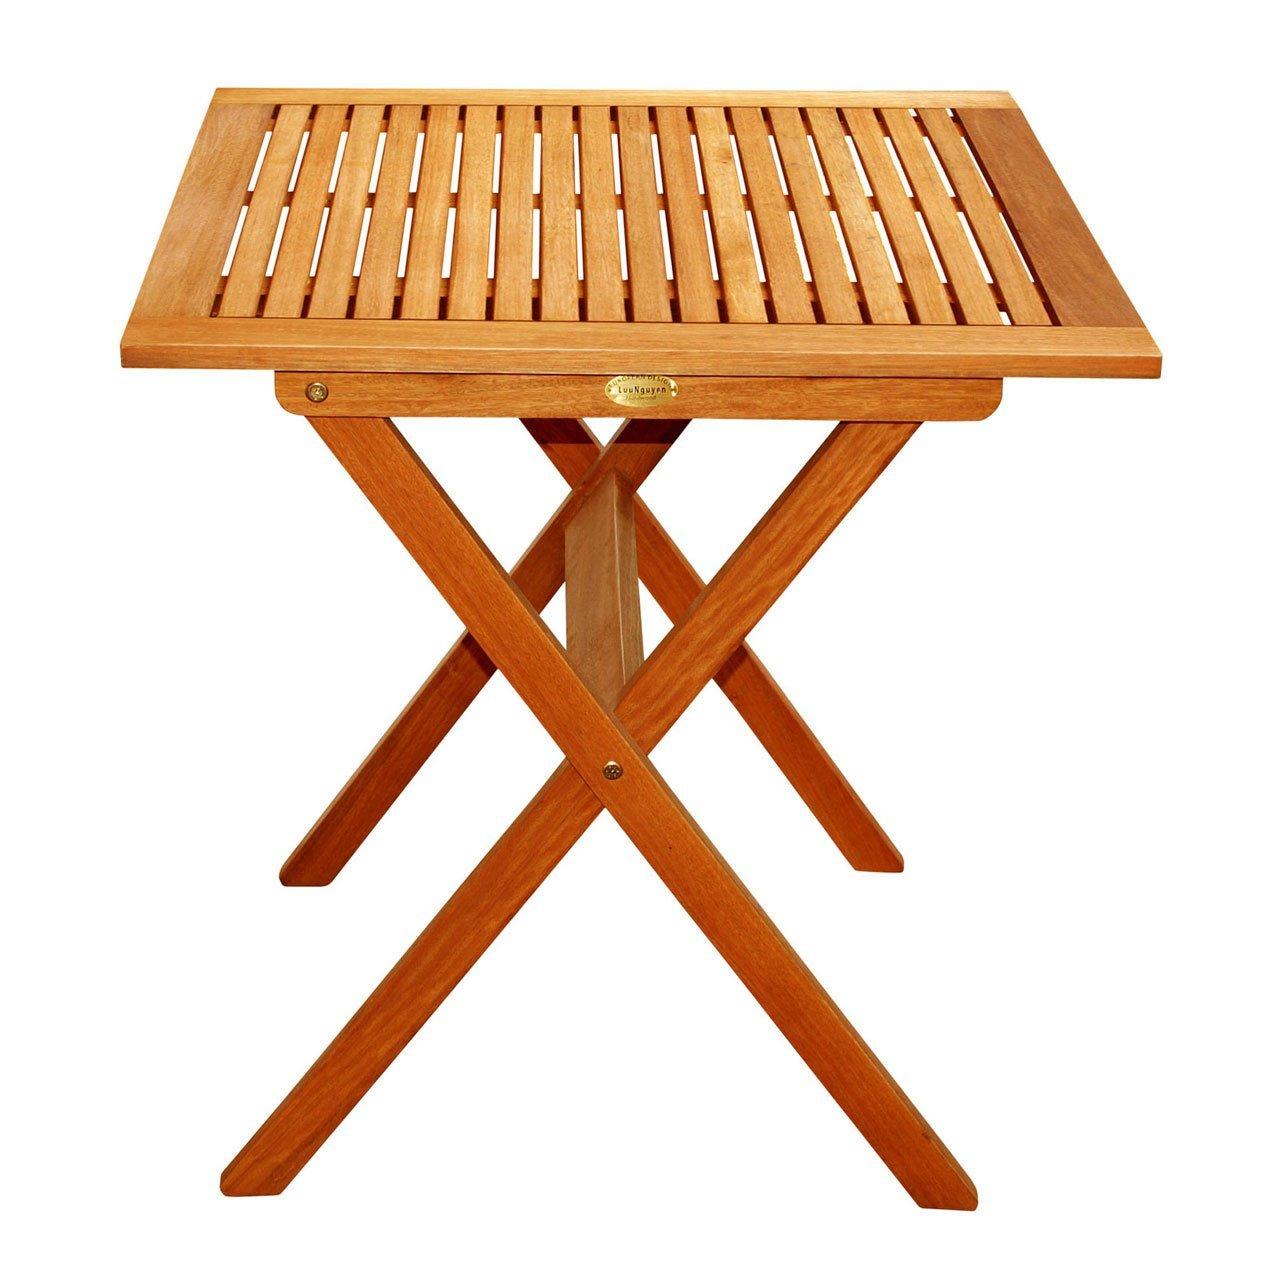 Amazon.com: LuuNguyen Outdoor Hardwood Folding Table(Natural Wood Finish):  Kitchen & Dining